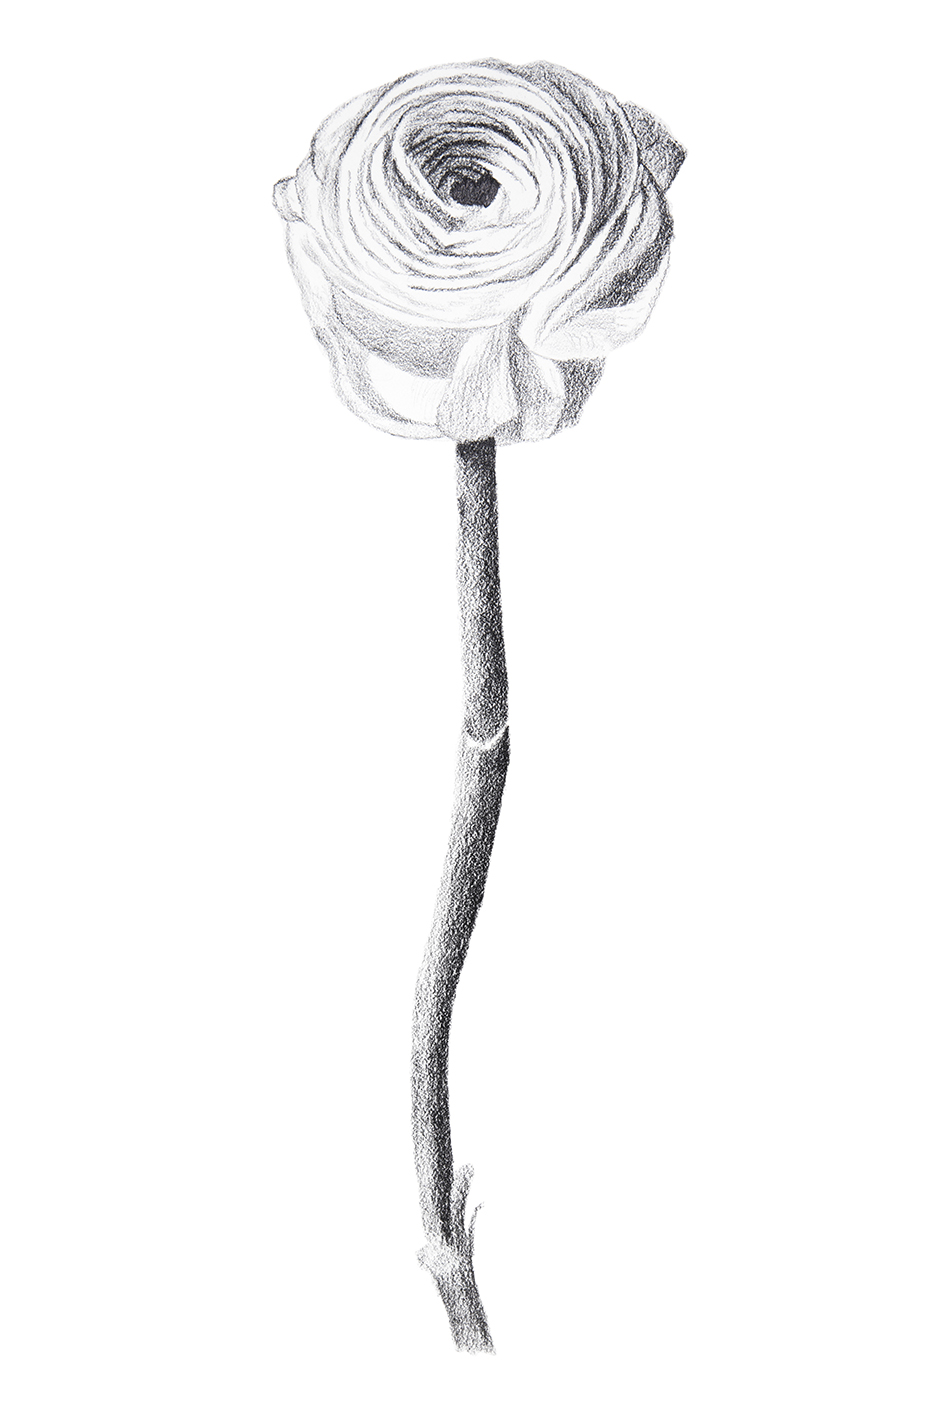 Flower Study 1 small.jpg